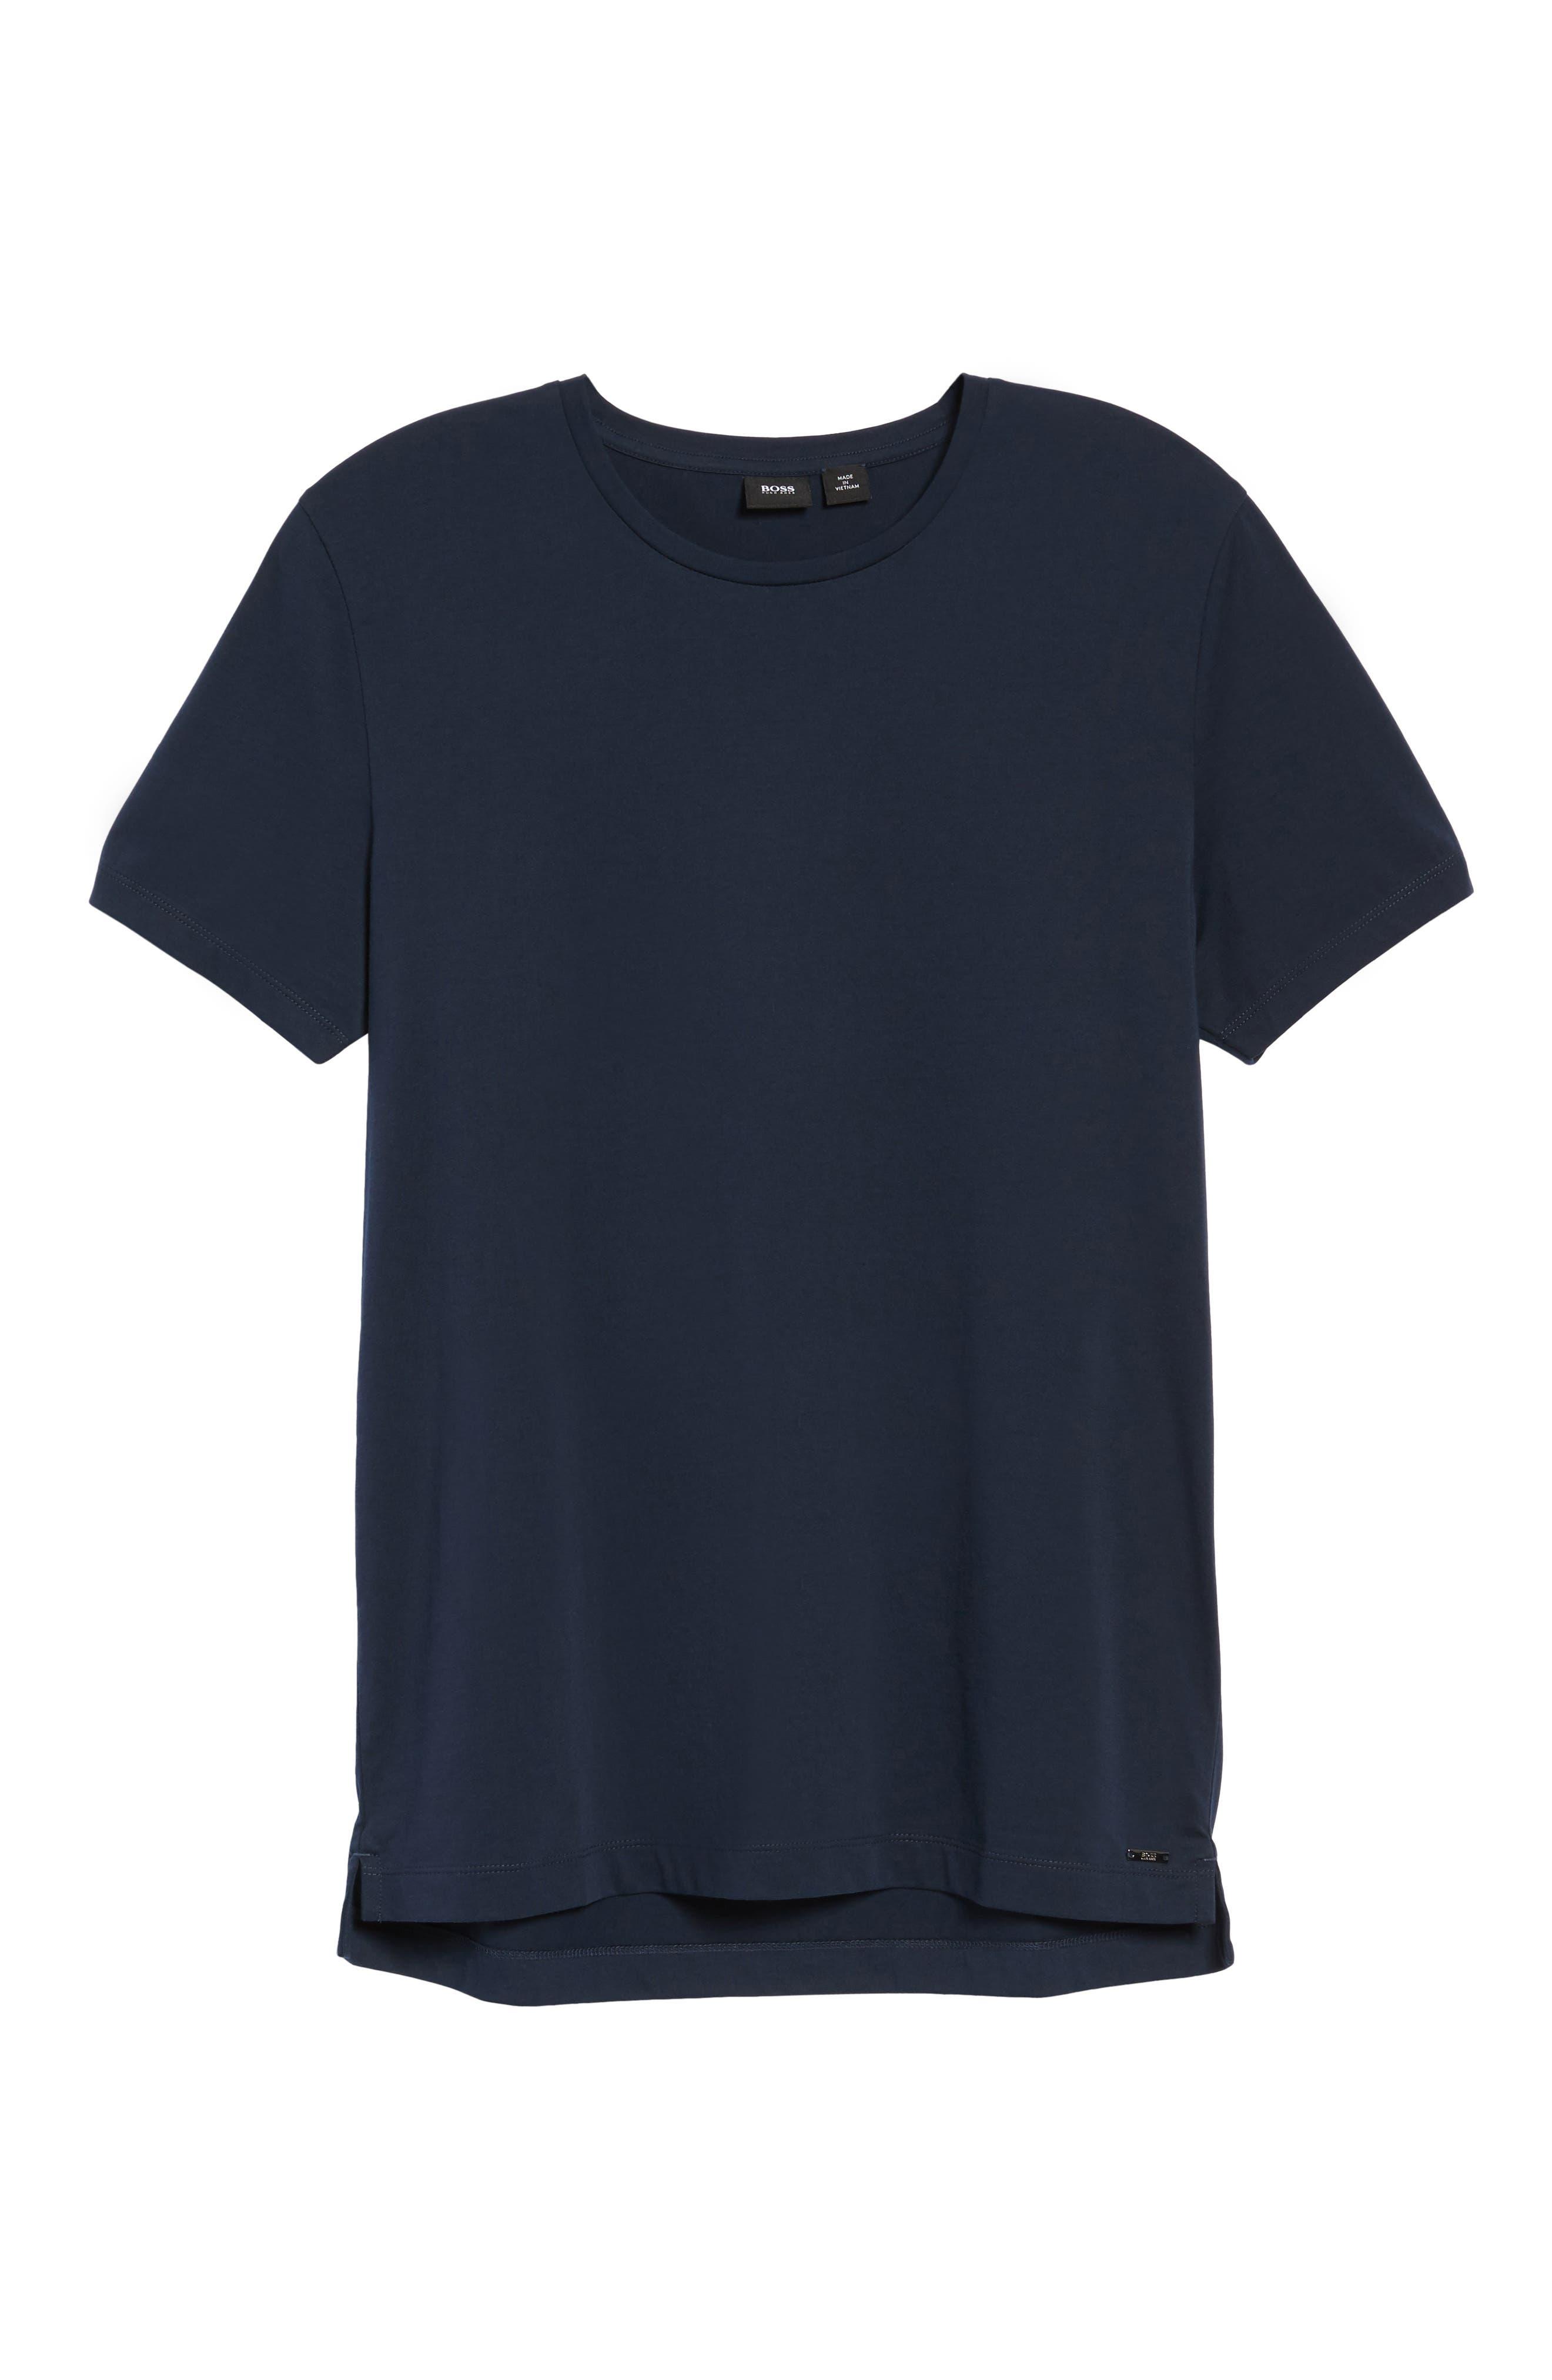 Tessler Crewneck T-Shirt,                             Alternate thumbnail 5, color,                             Black